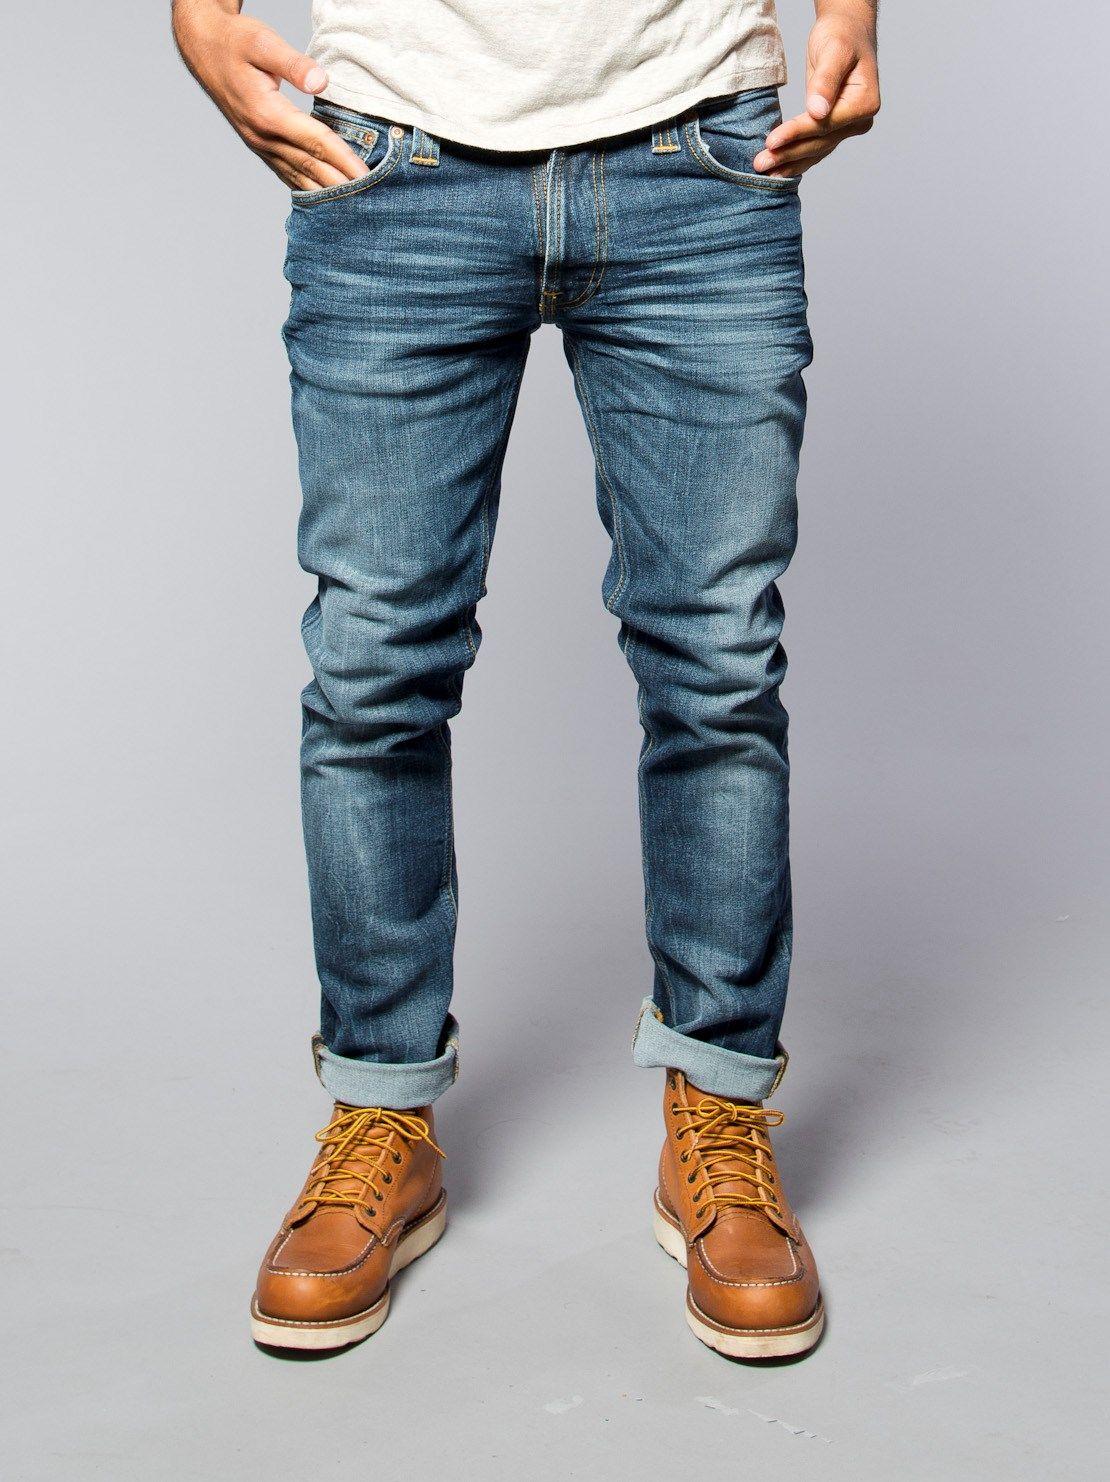 0fbec6ff00 Thin Finn Organic Midnight Worn - Nudie Jeans Co Online Shop ...